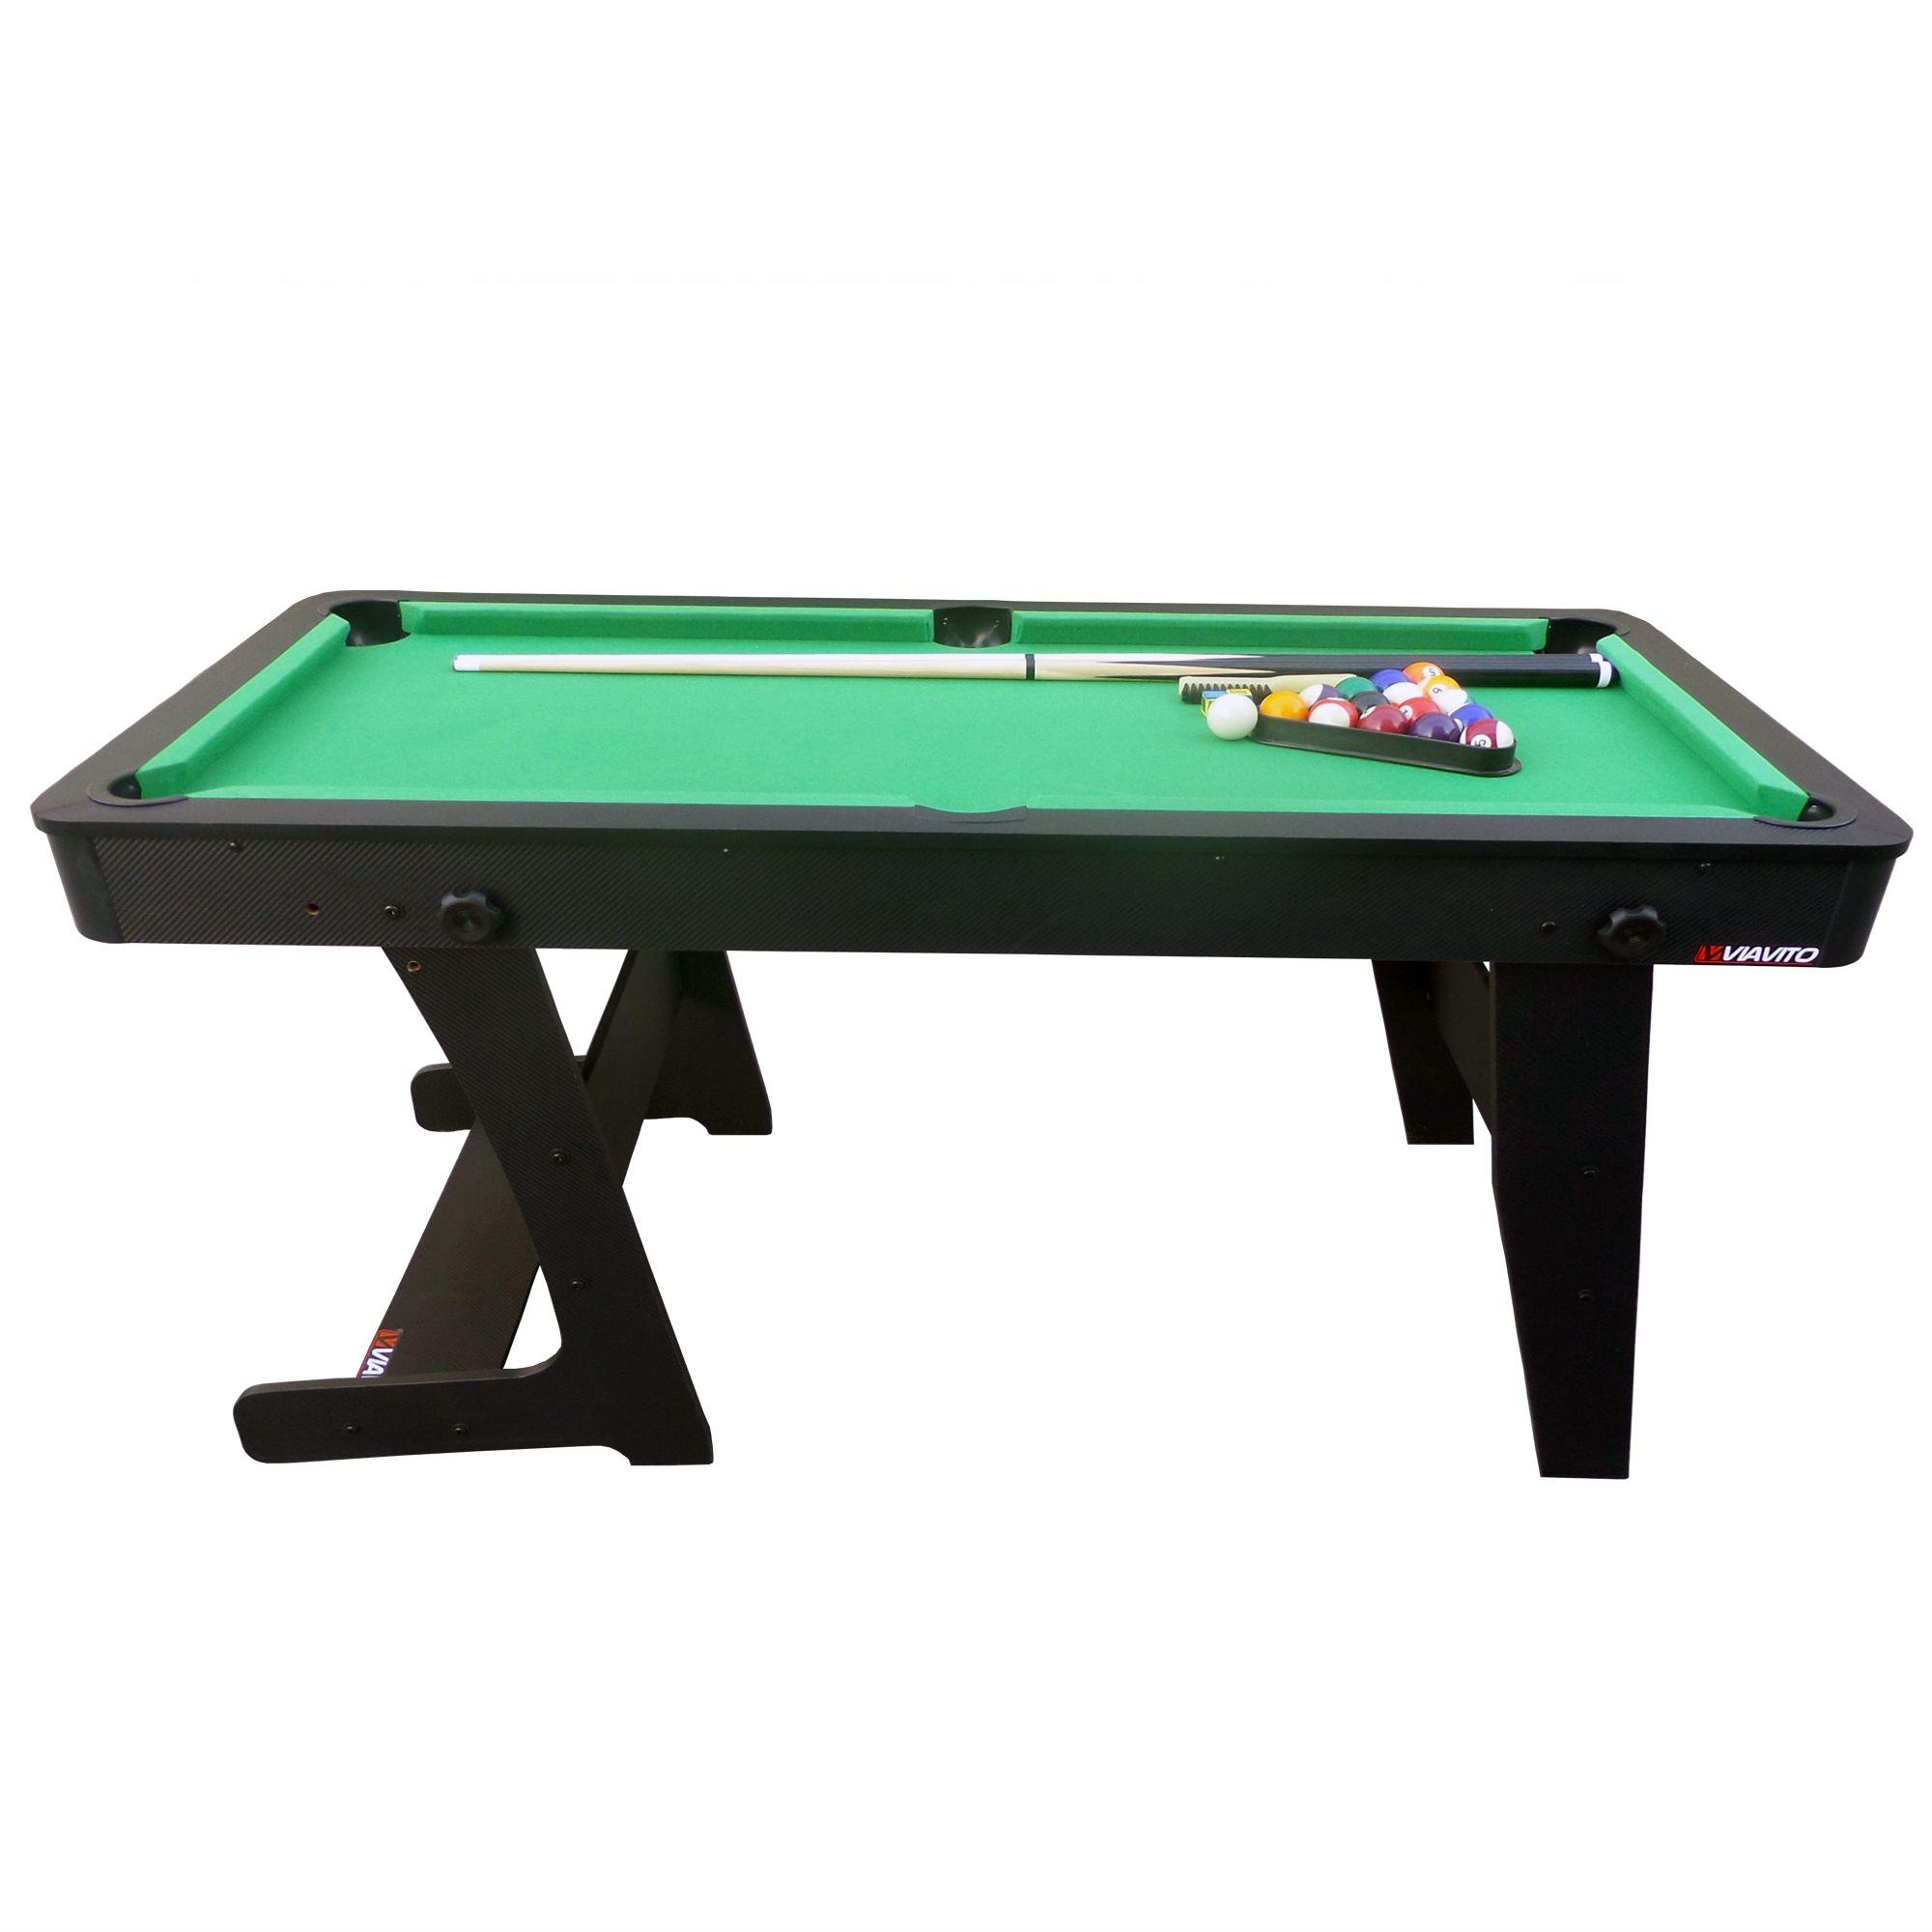 Viavito pt100x 5ft folding pool table for 11 x table games